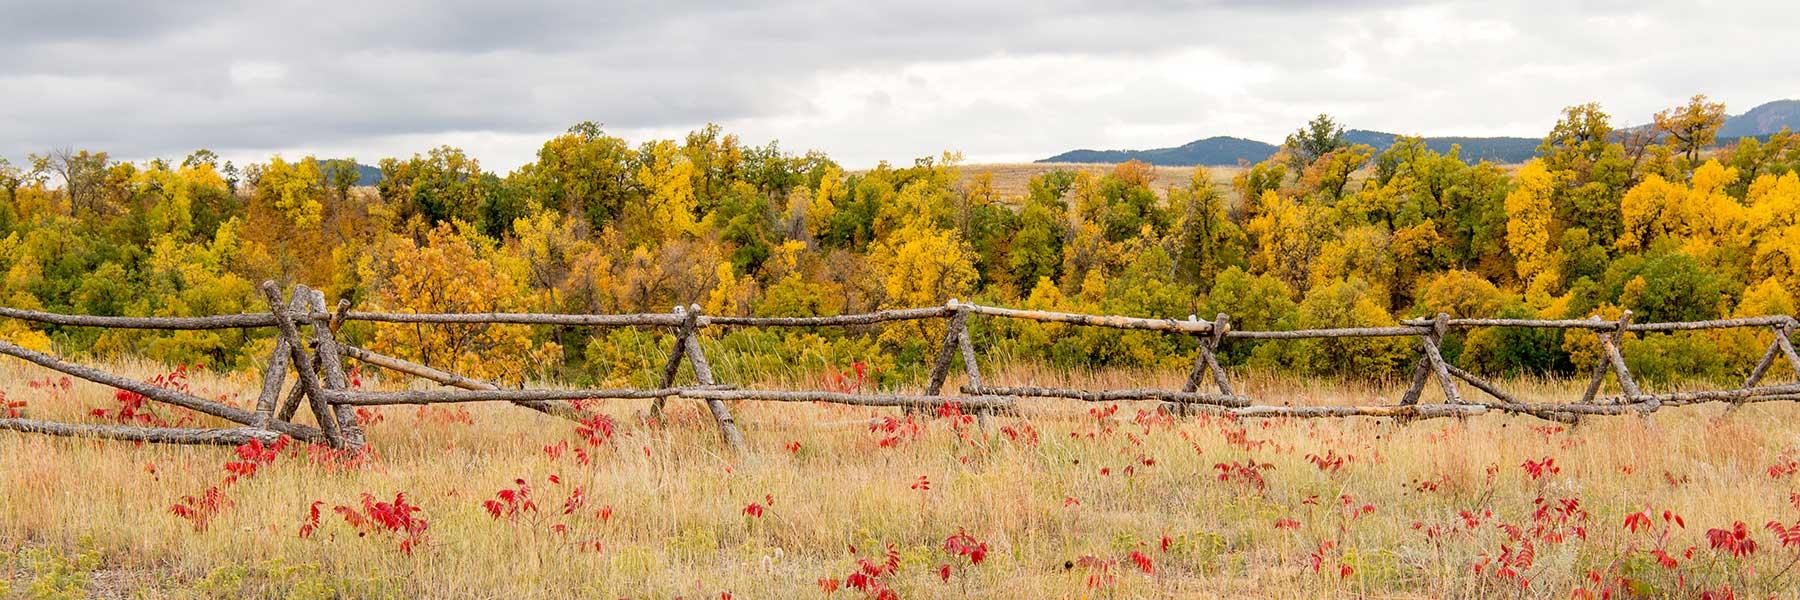 Elkhorn Ridge landscape